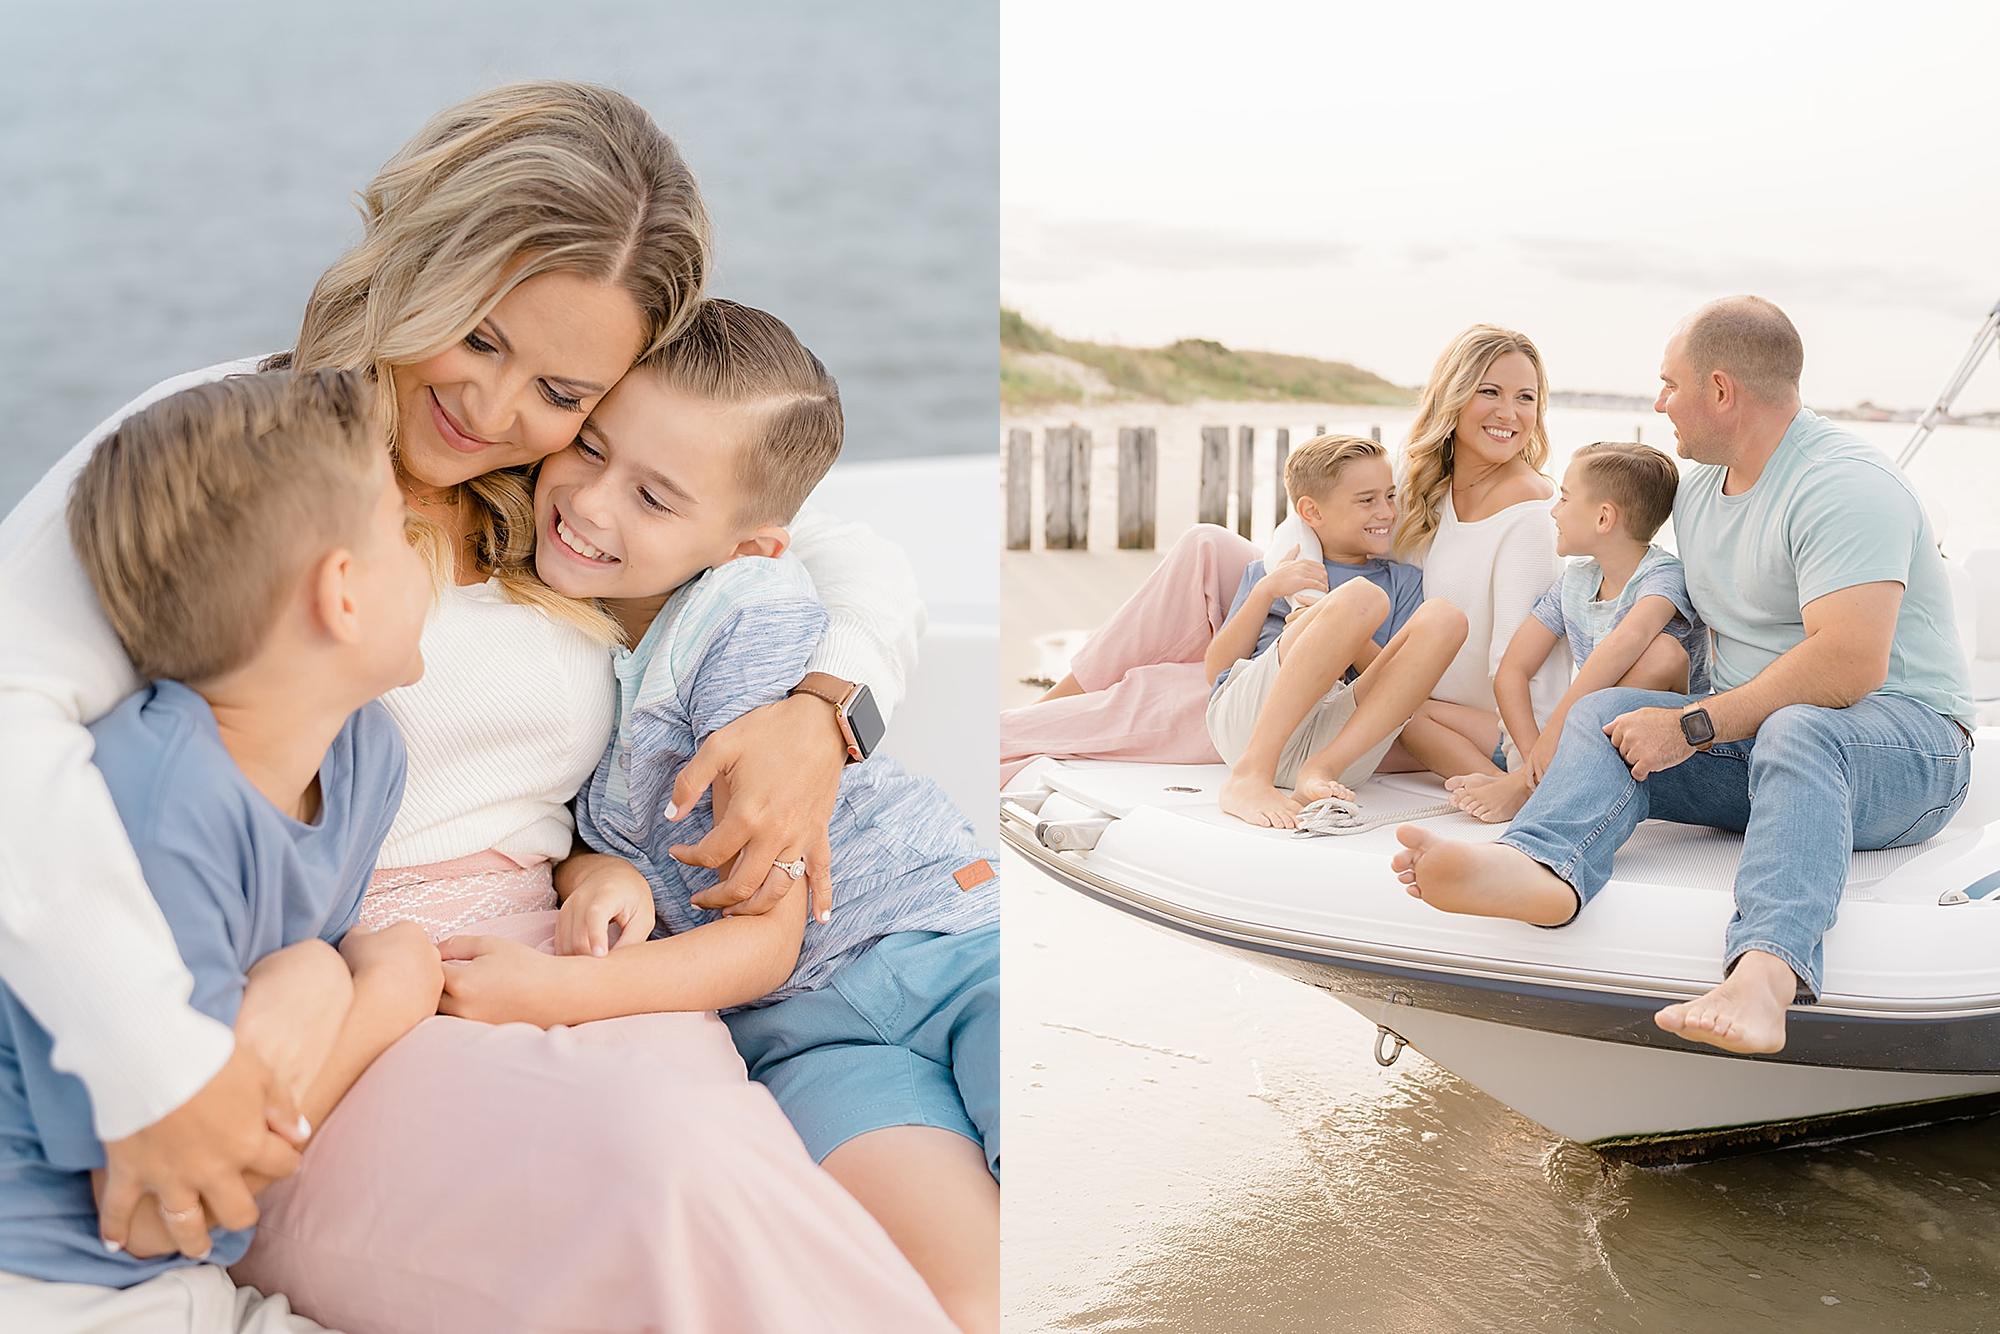 Ocean City Family Photography by Magdalena Studios 0012